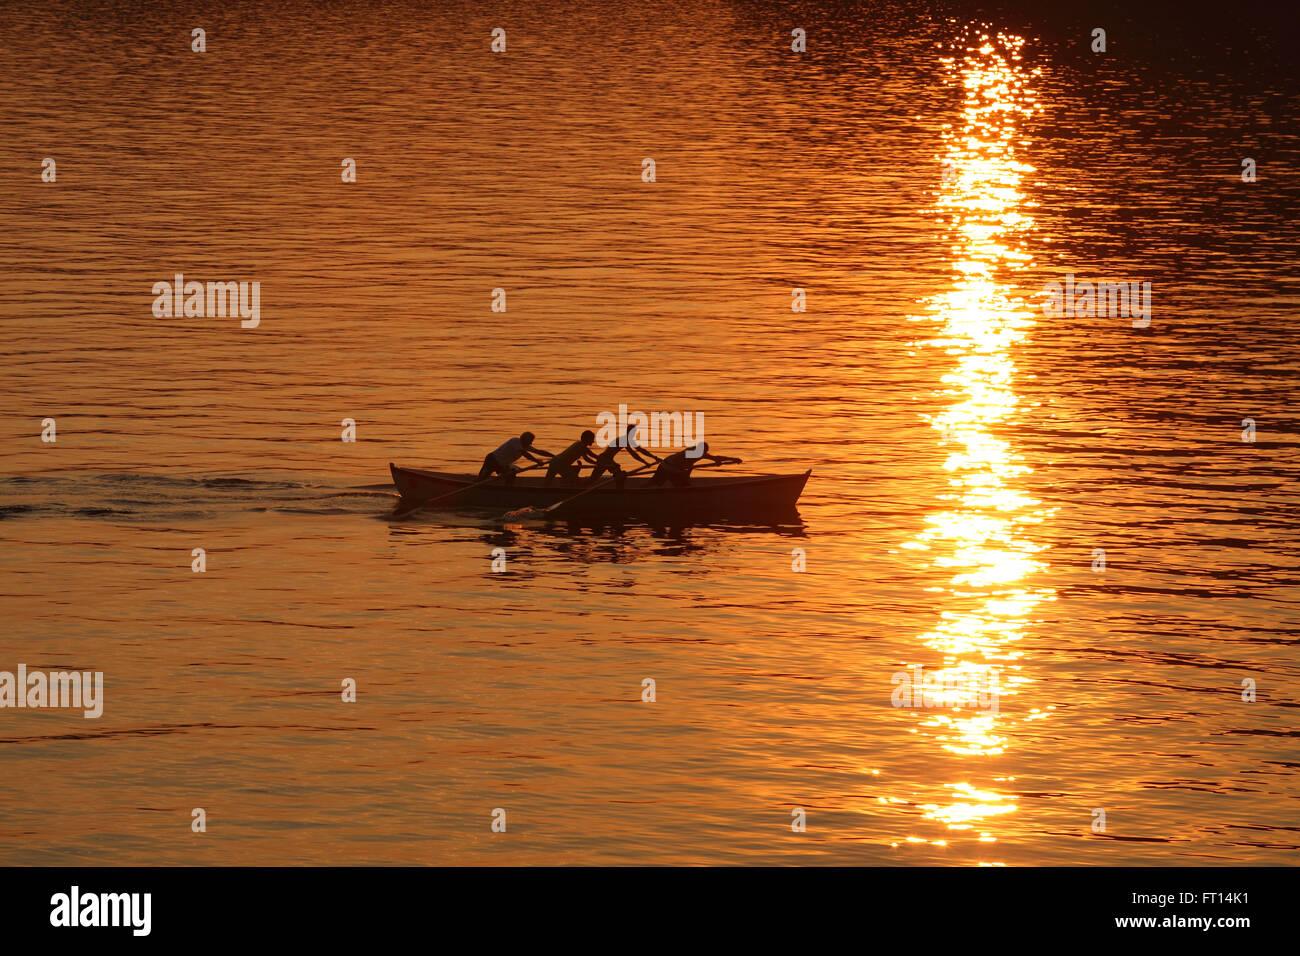 Rowing boat in evening sun, Torri del Benaco, Lake Garda, Verona, Veneto, Italy Stock Photo